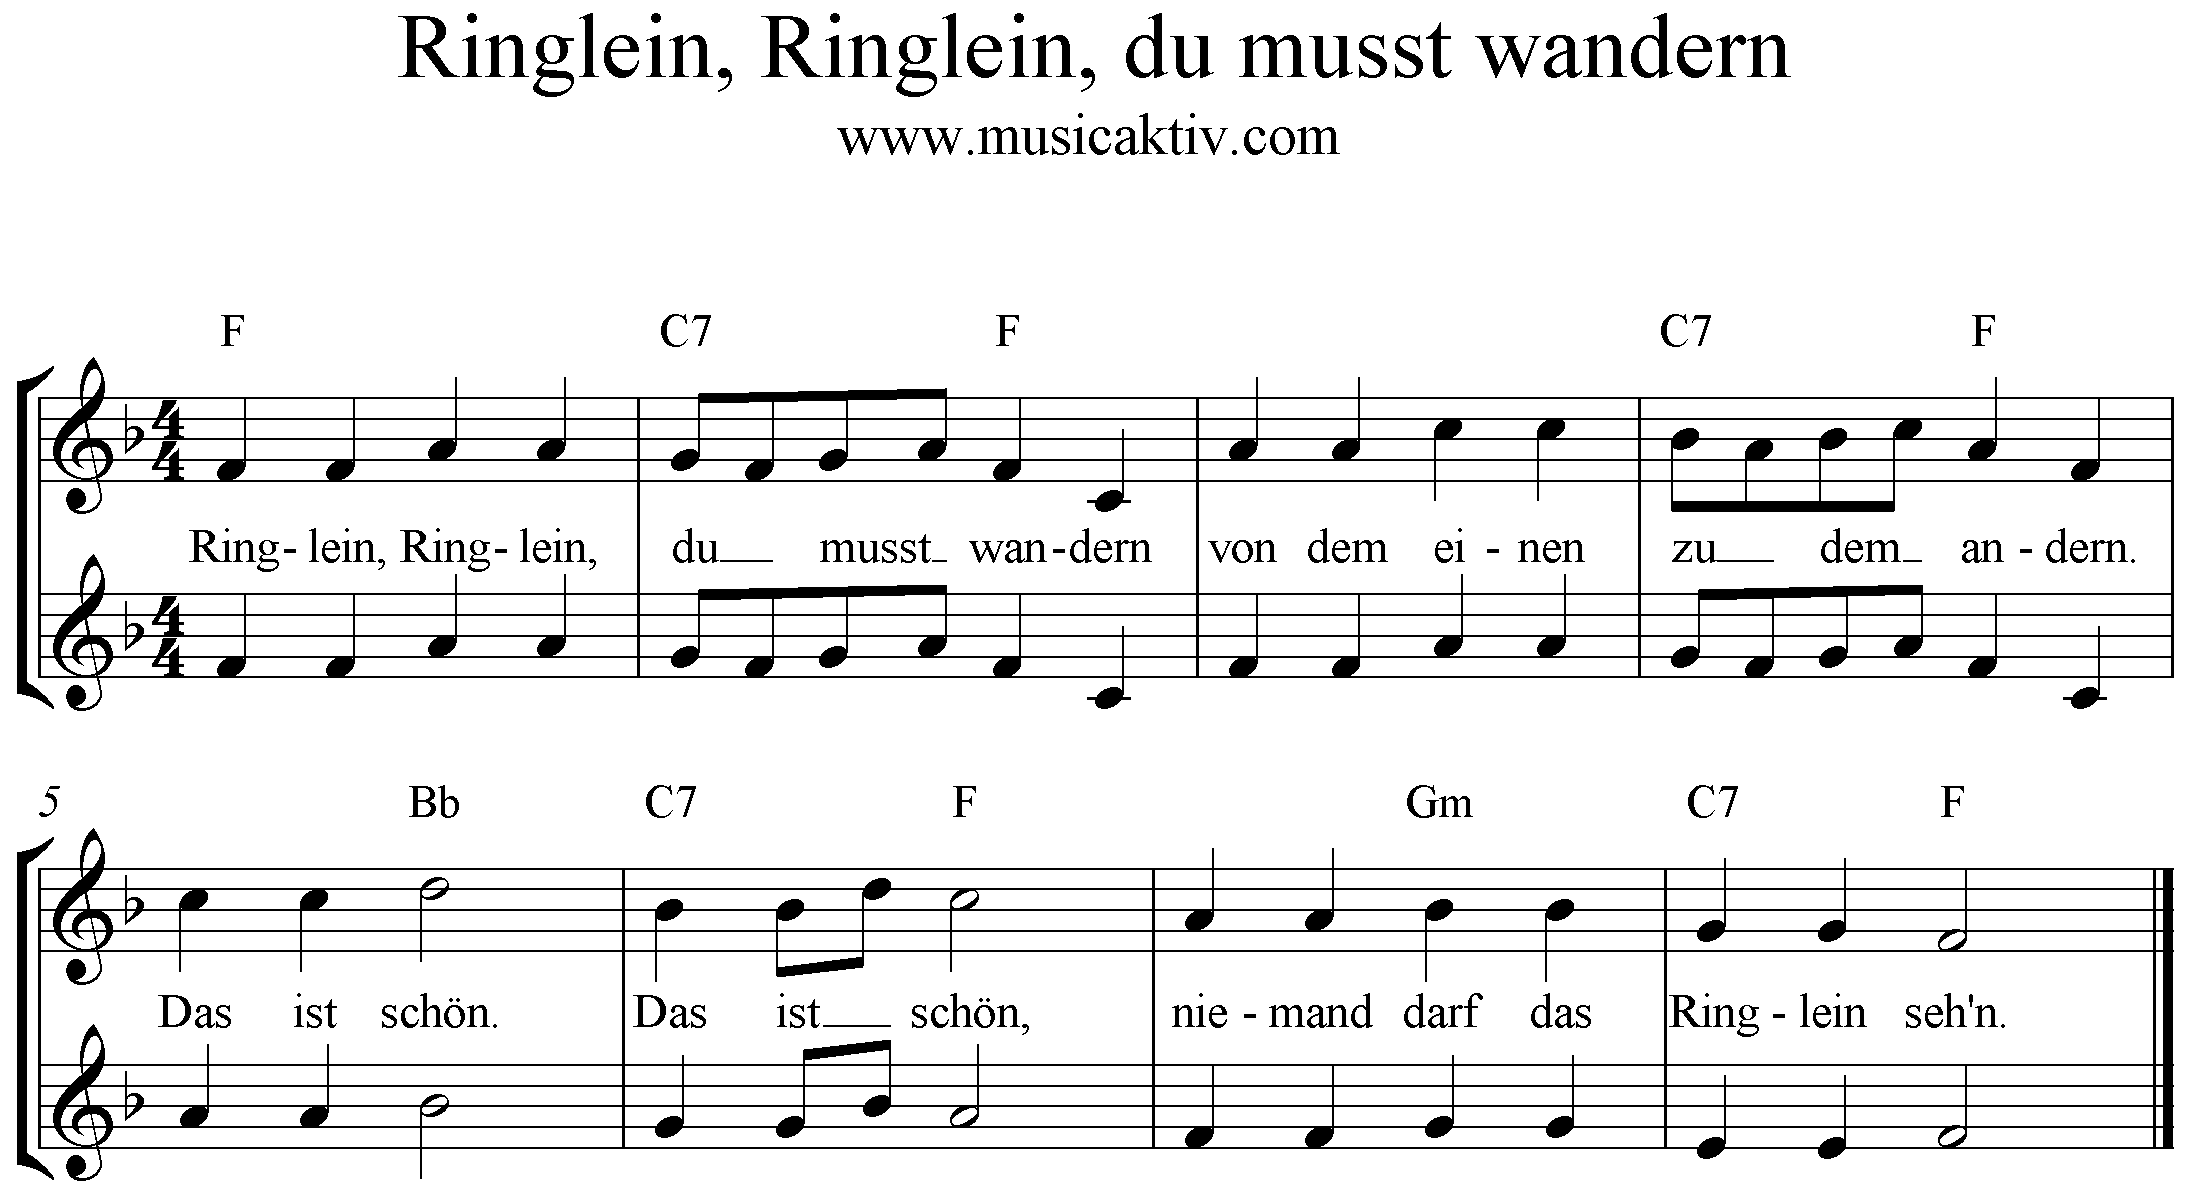 Ringlein Ringlein Du Musst Wandern